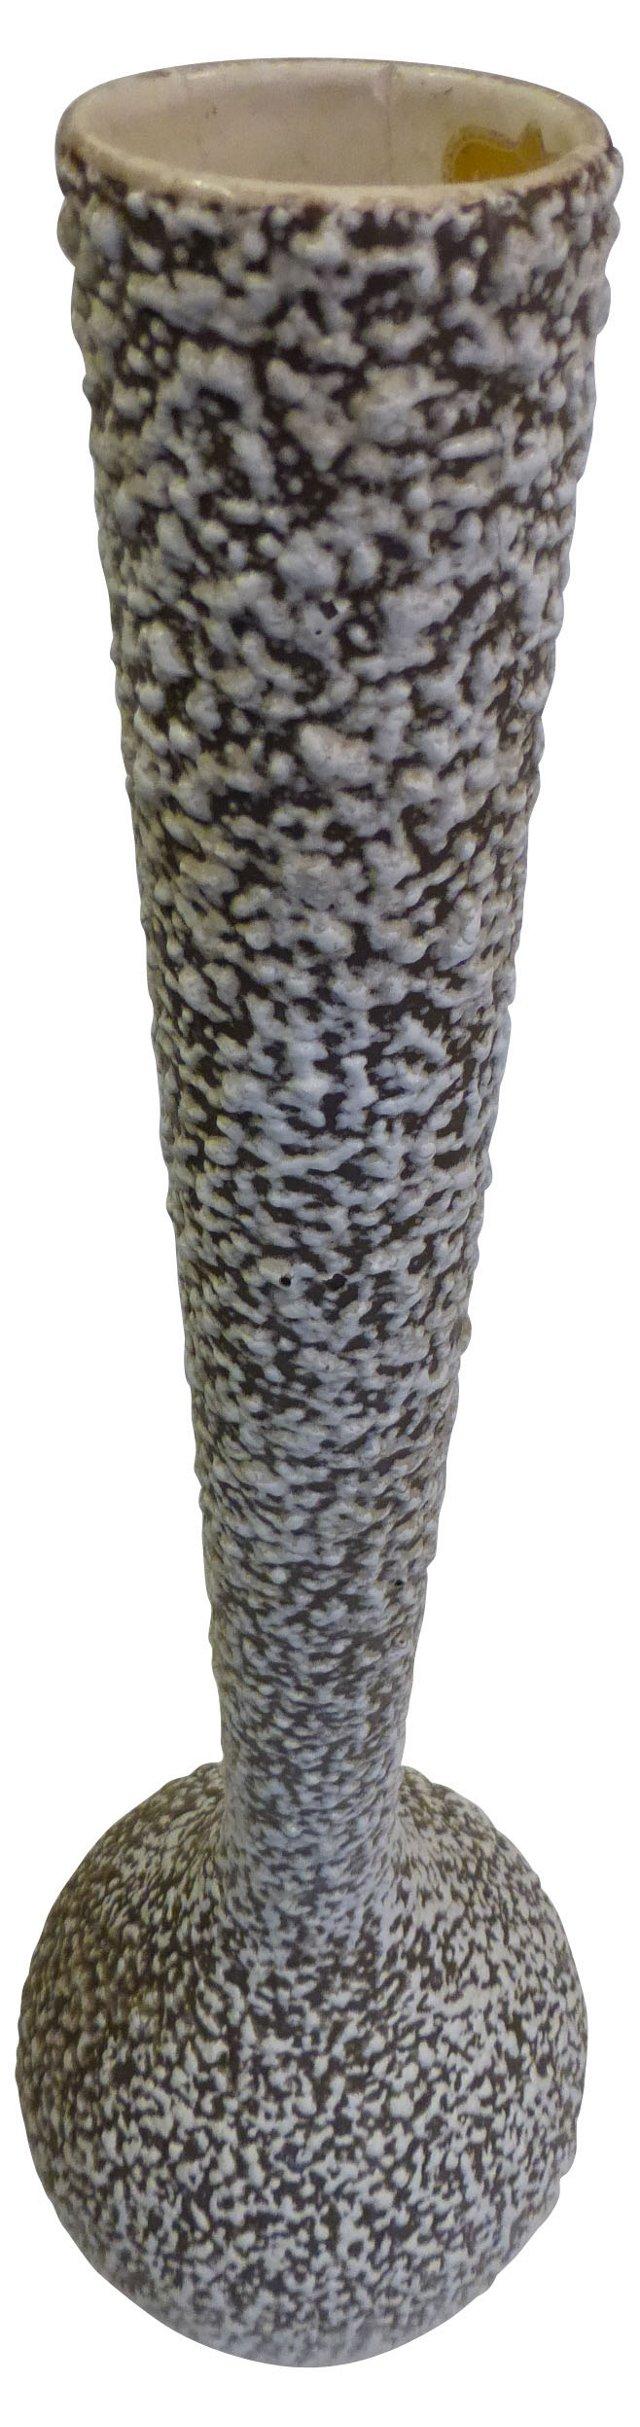 Ceramic Volcanic Vase